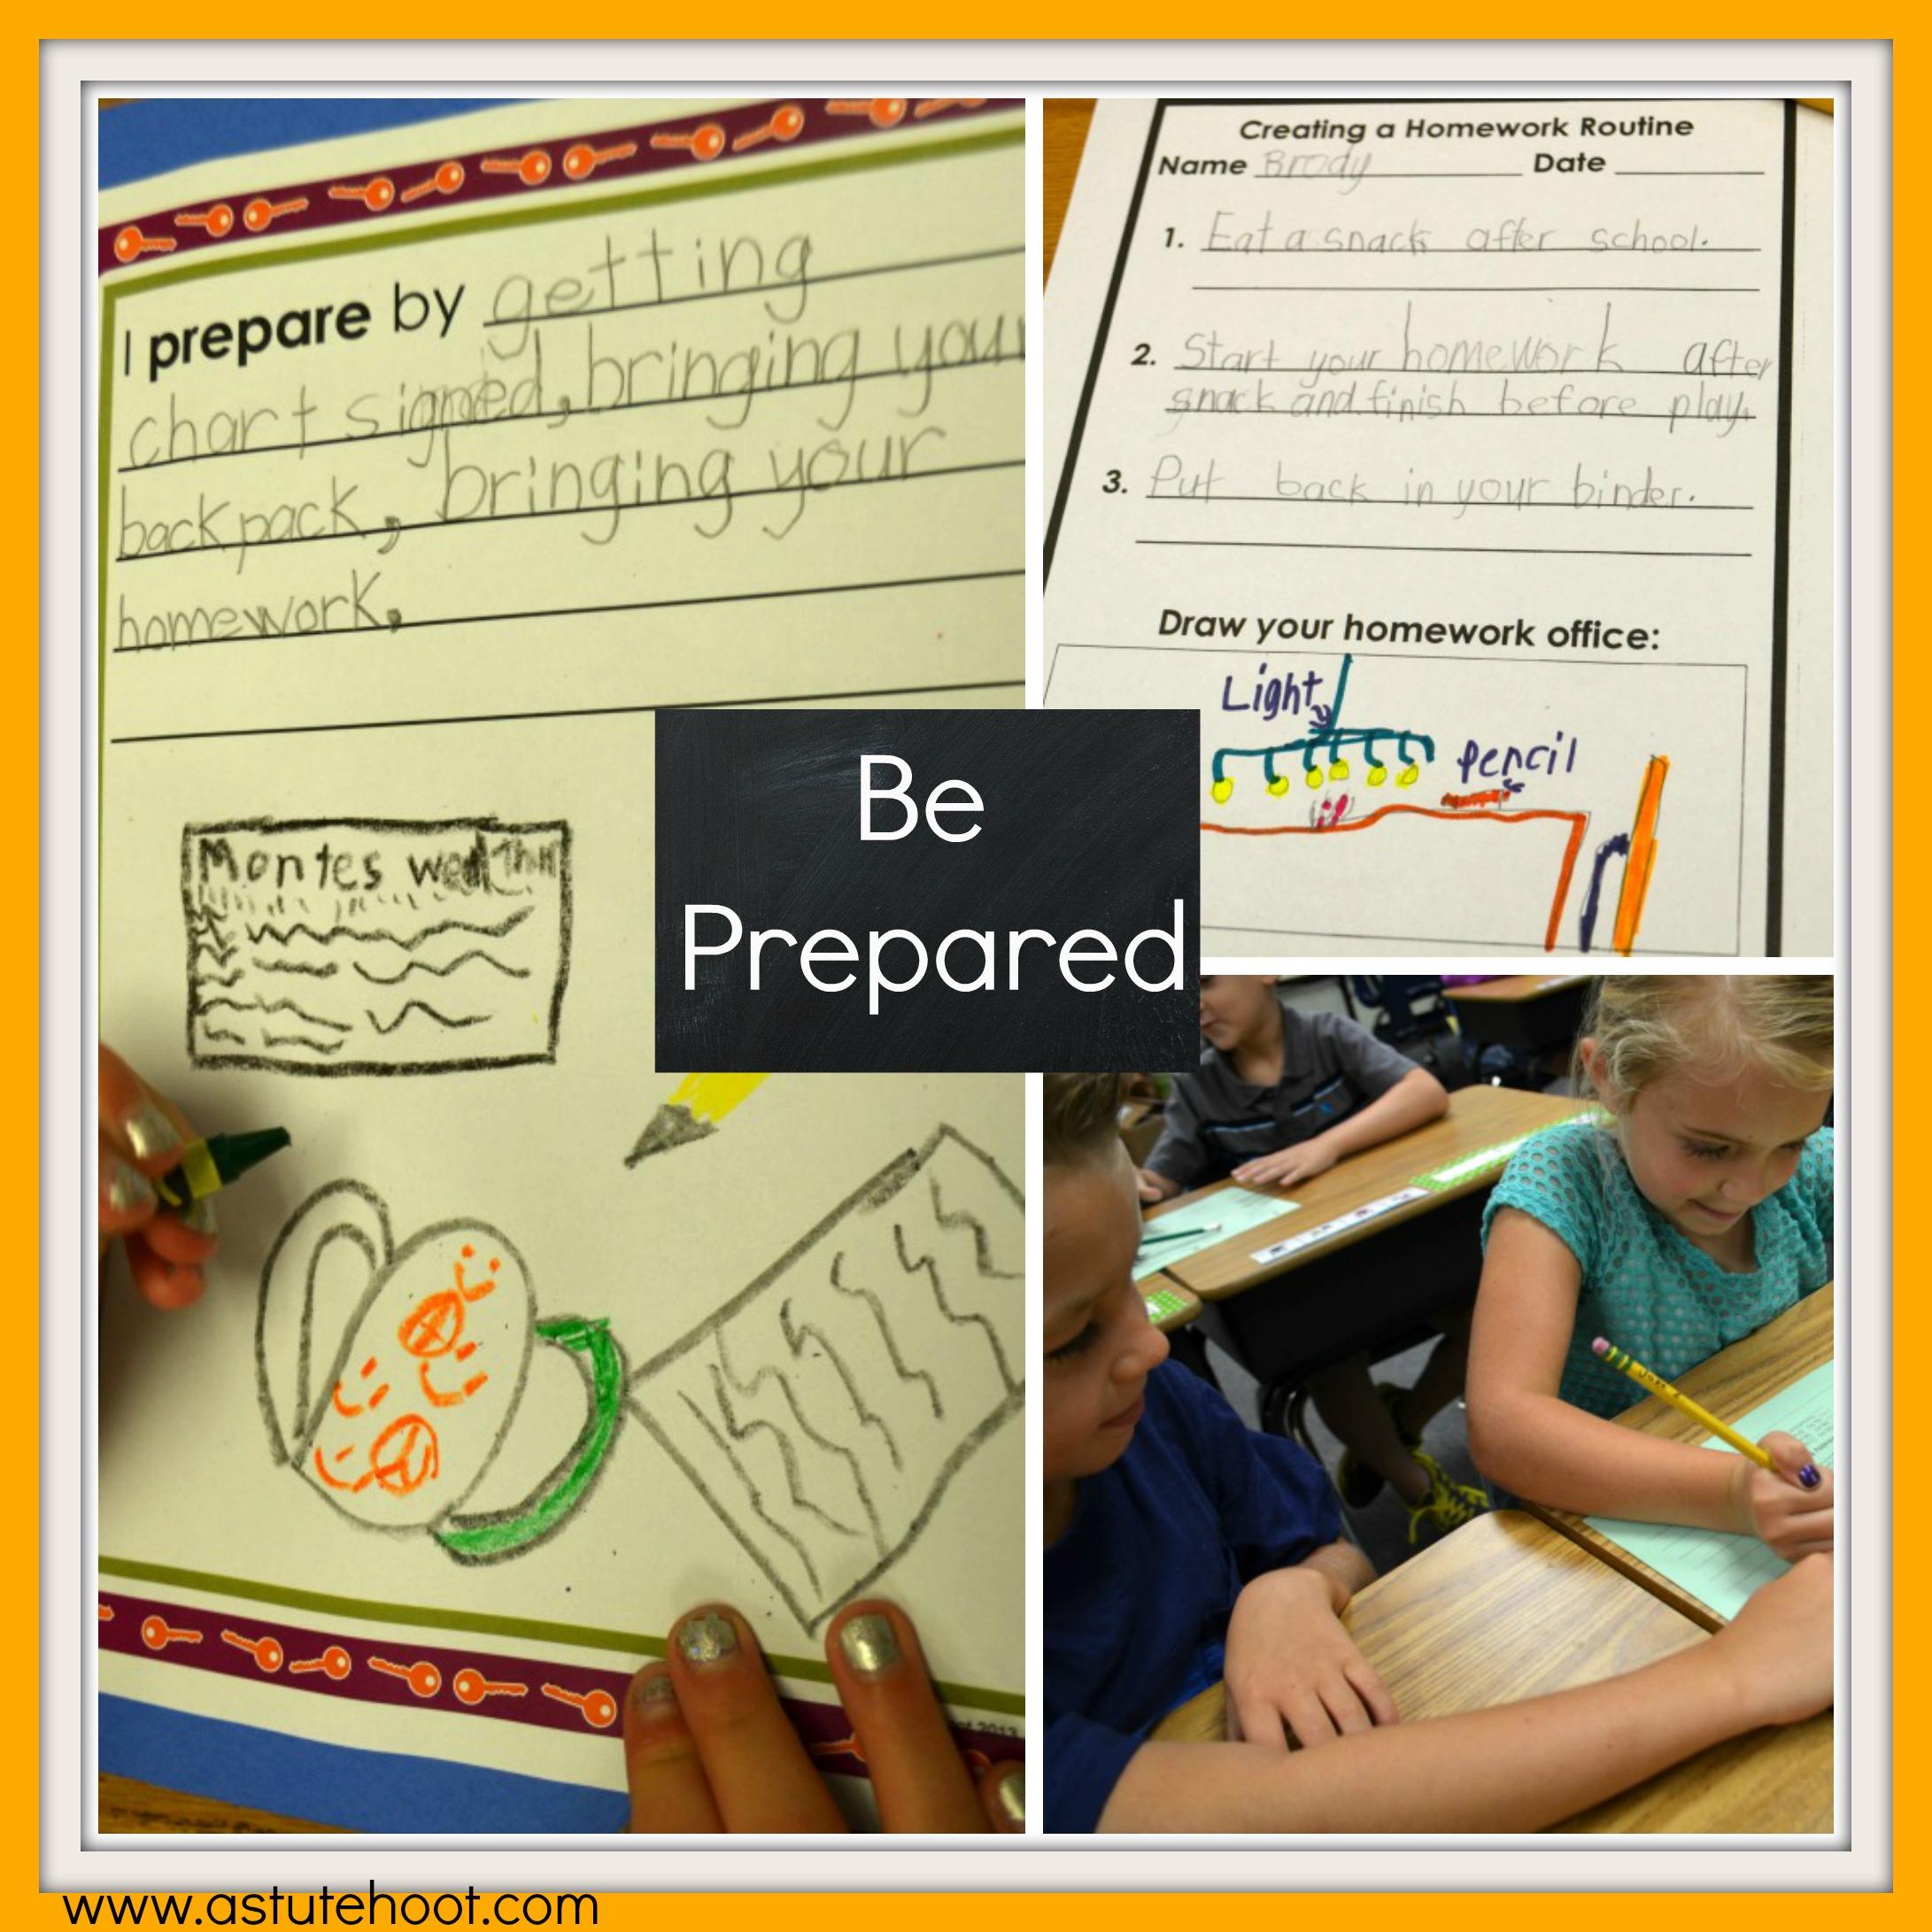 Golden Keys to Success, classroom management plans, behavior modification